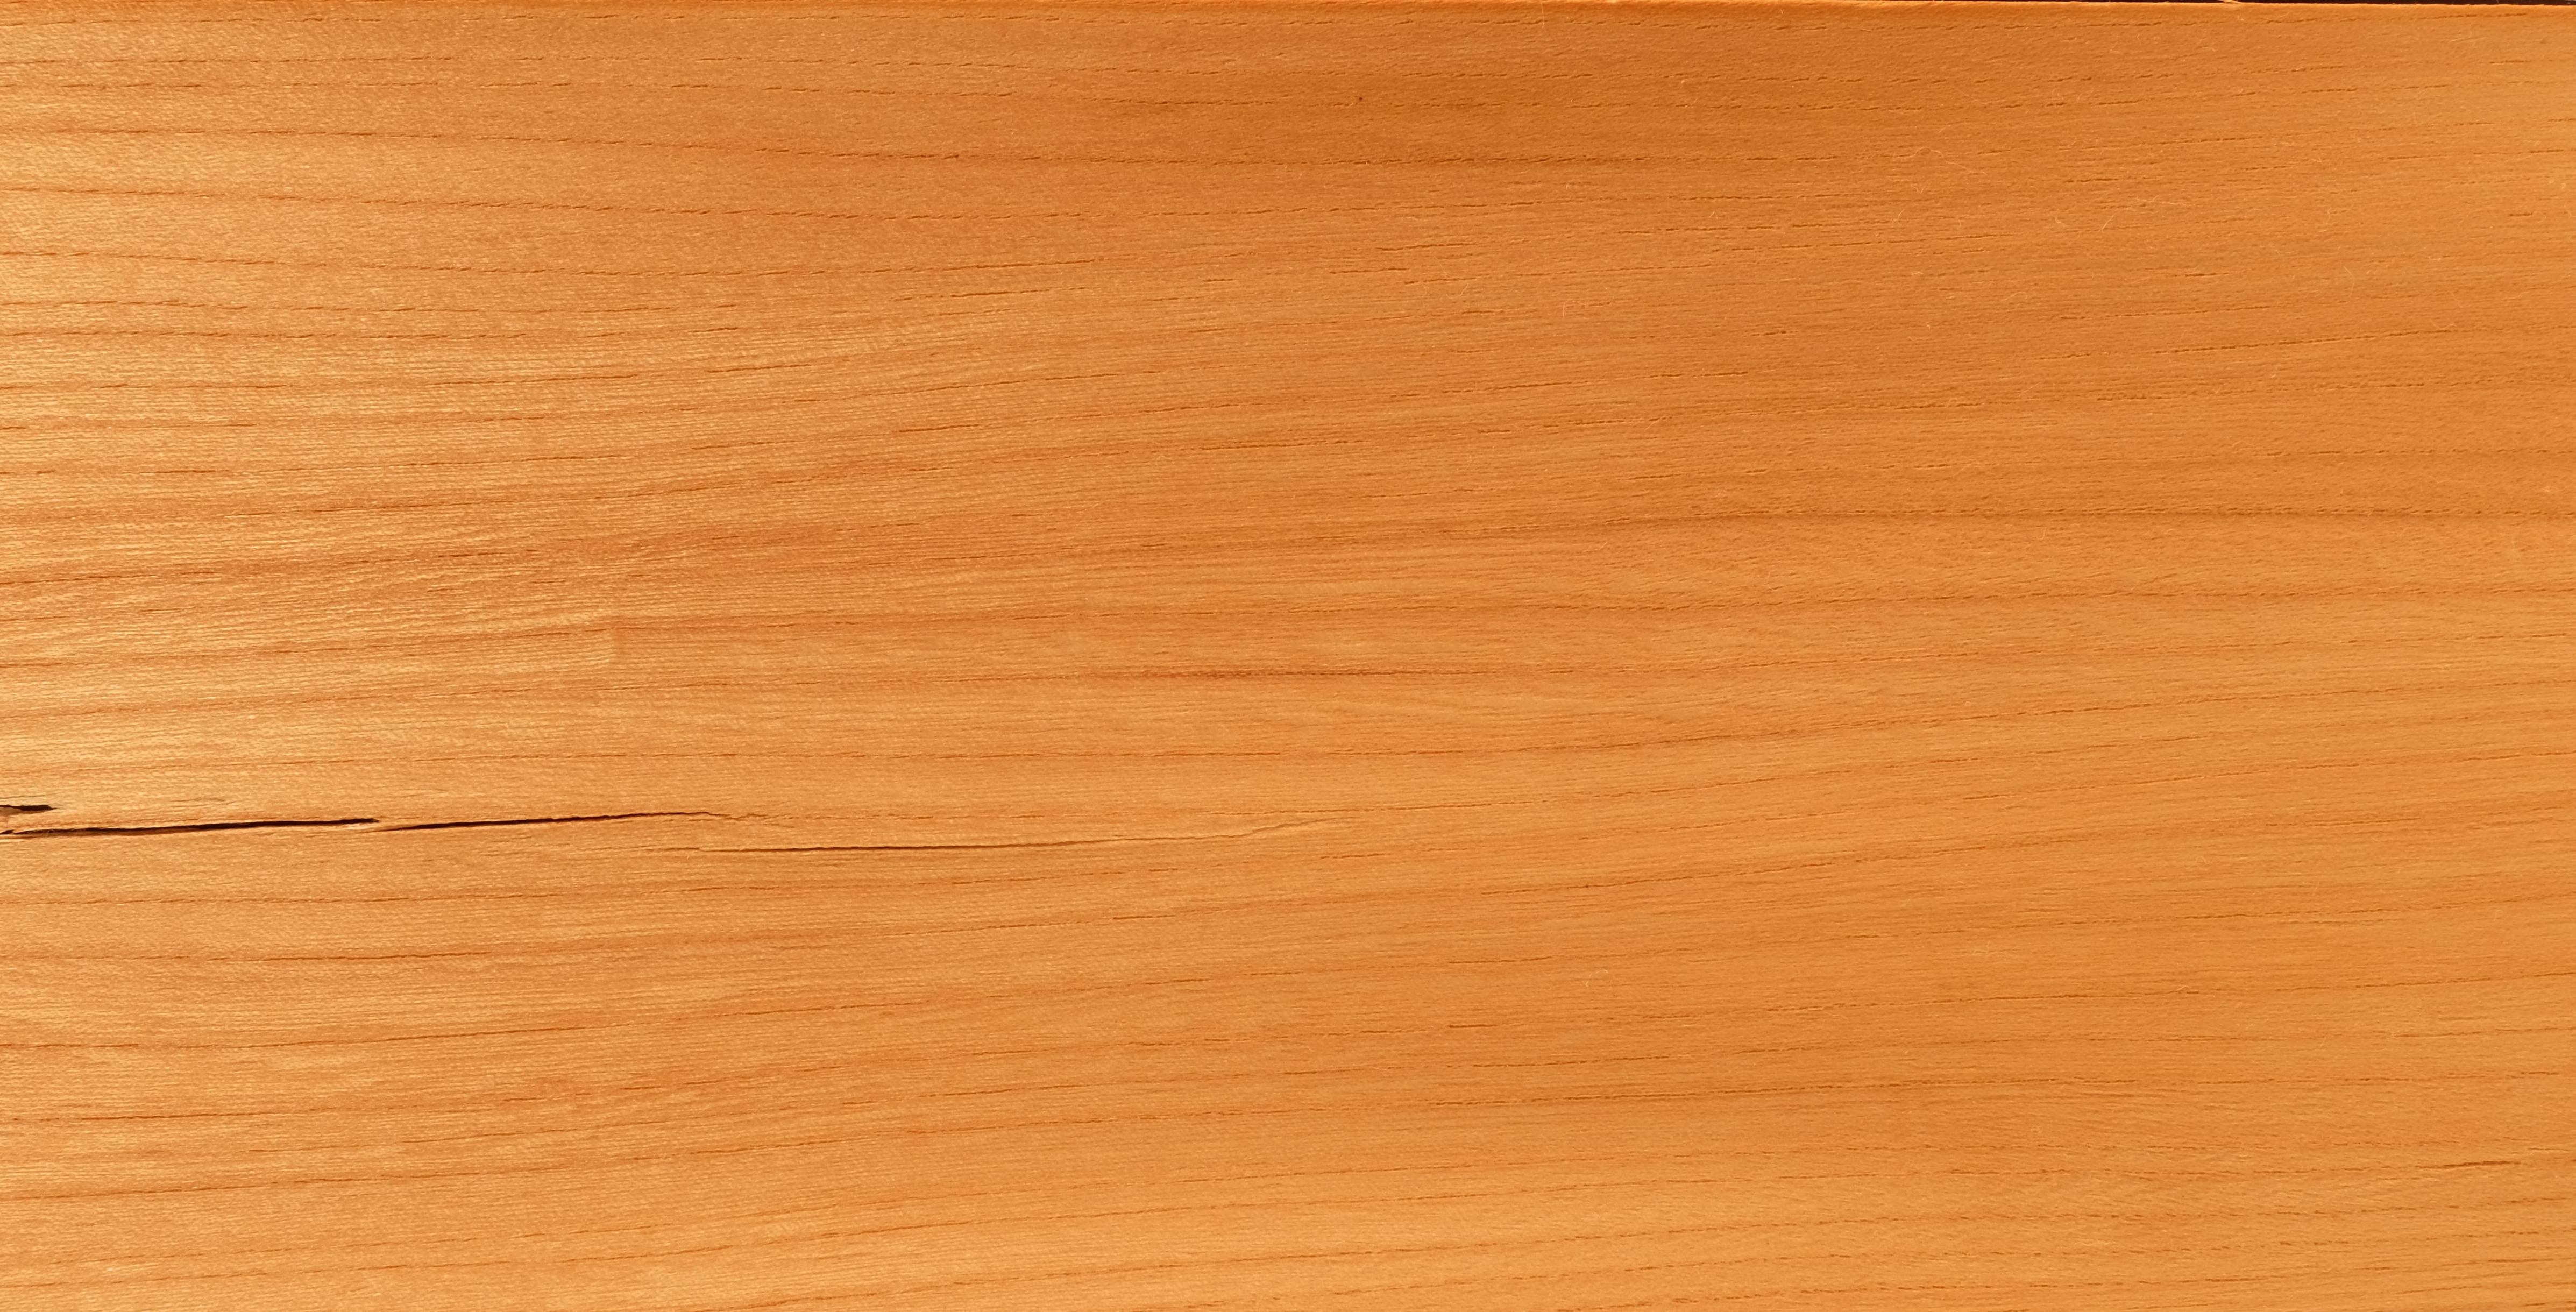 Rüster Holz file kanadischer rüster holz jpg wikimedia commons